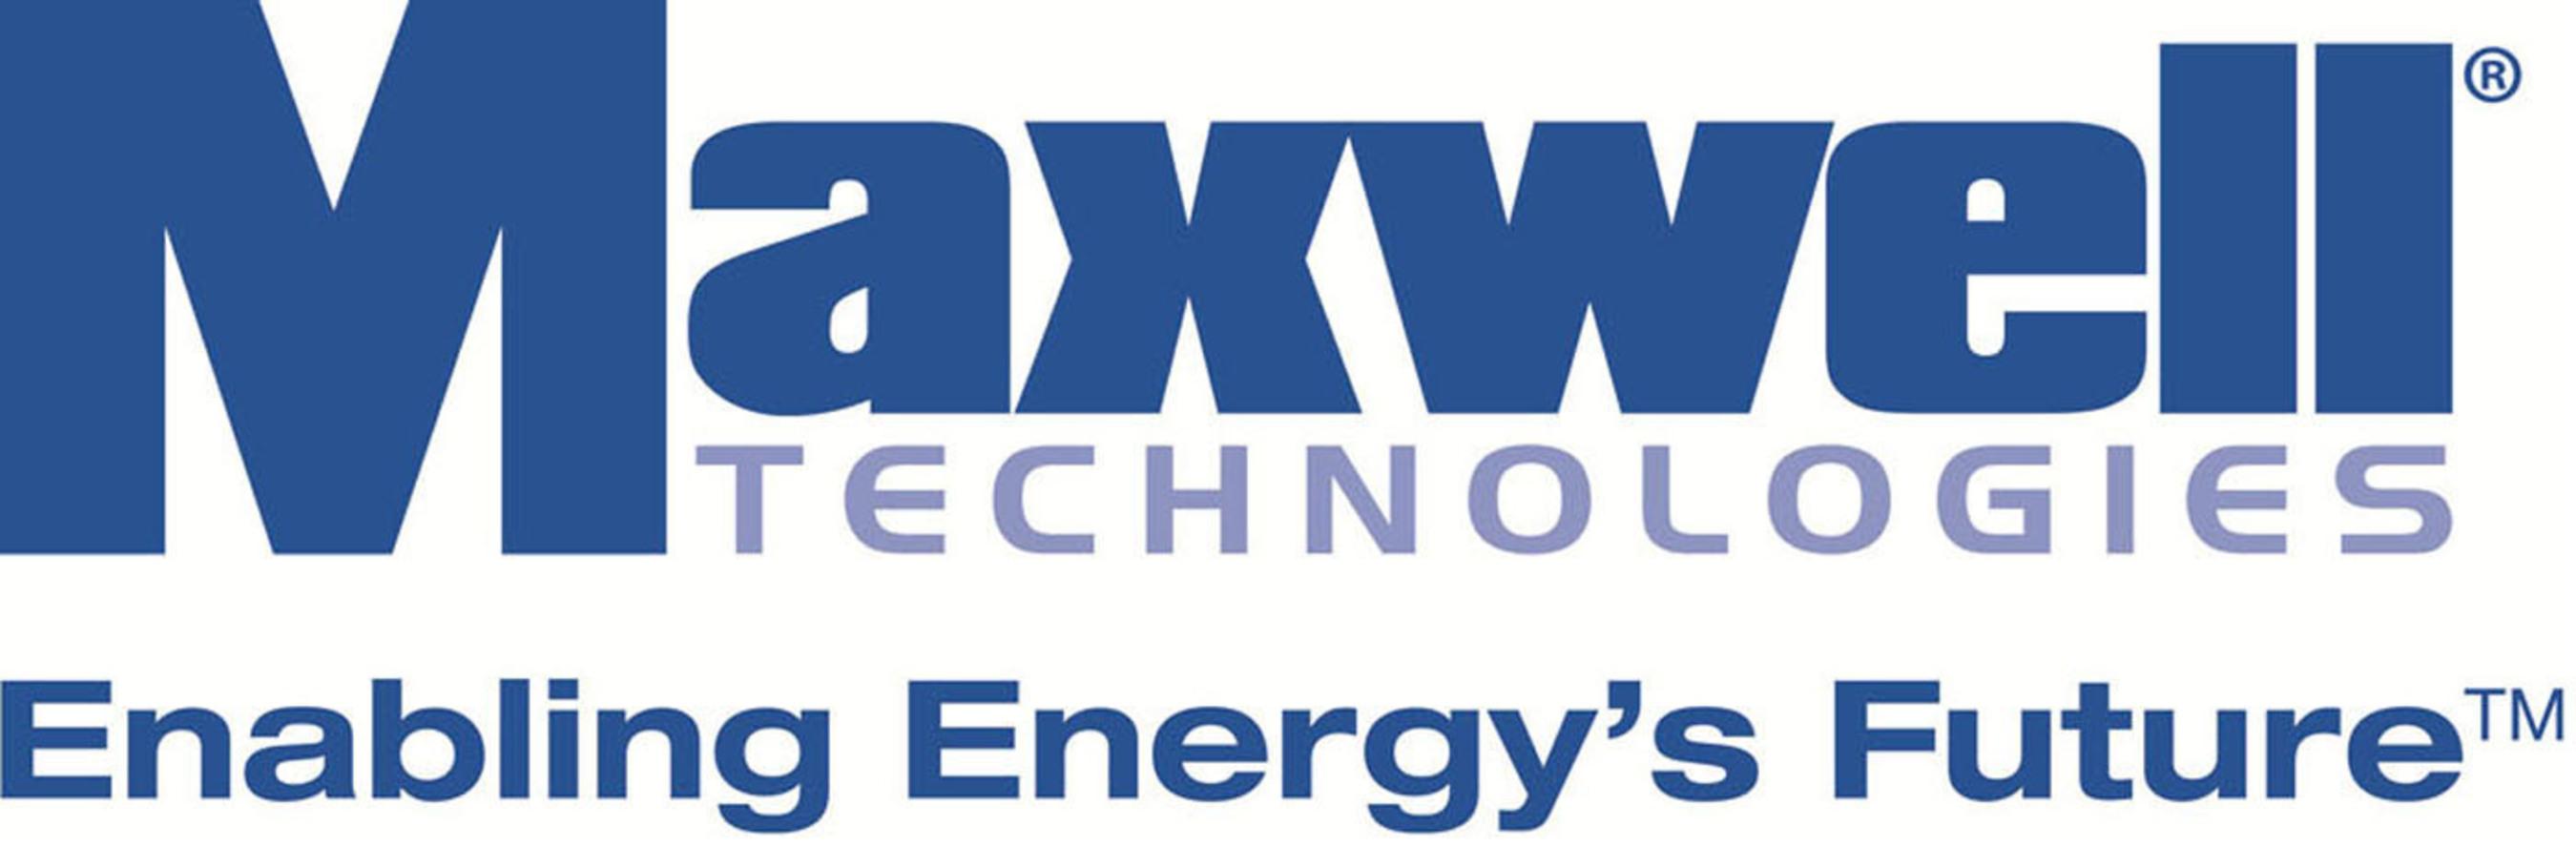 Enabling Energy's Future.